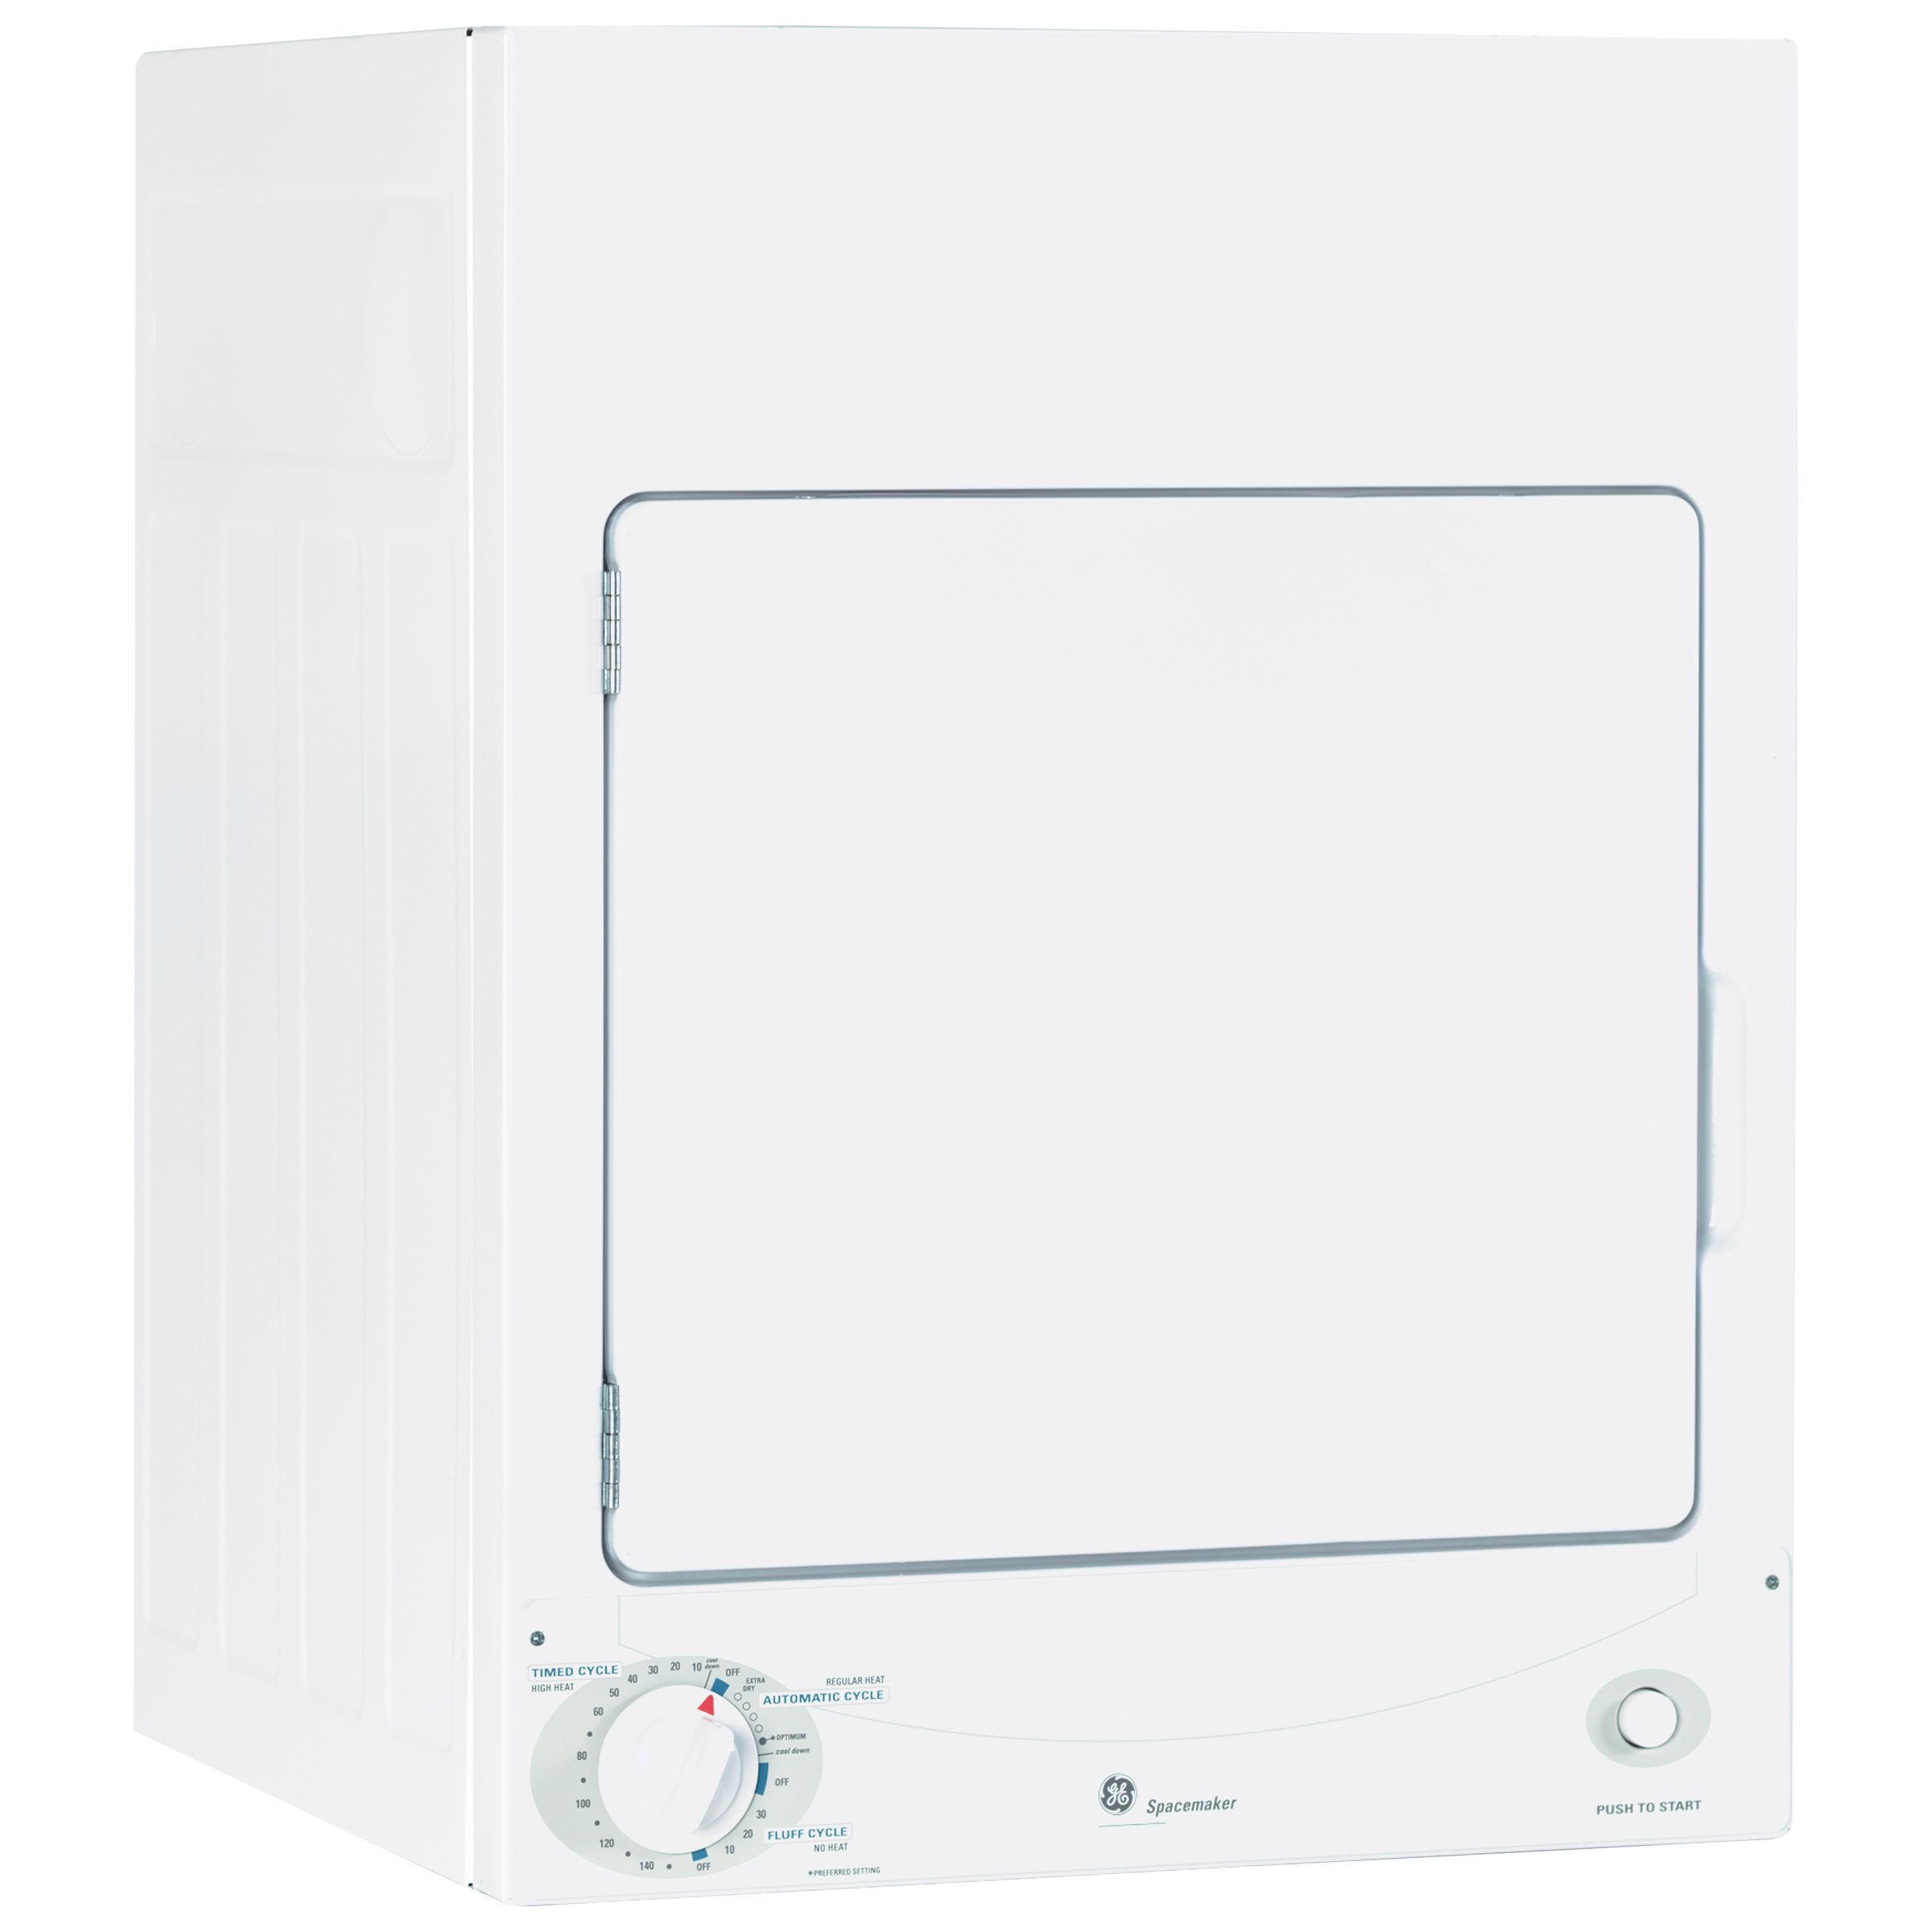 GE Appliances DSKS333ECWW 3.6 cu. ft. Electric Dryer - White